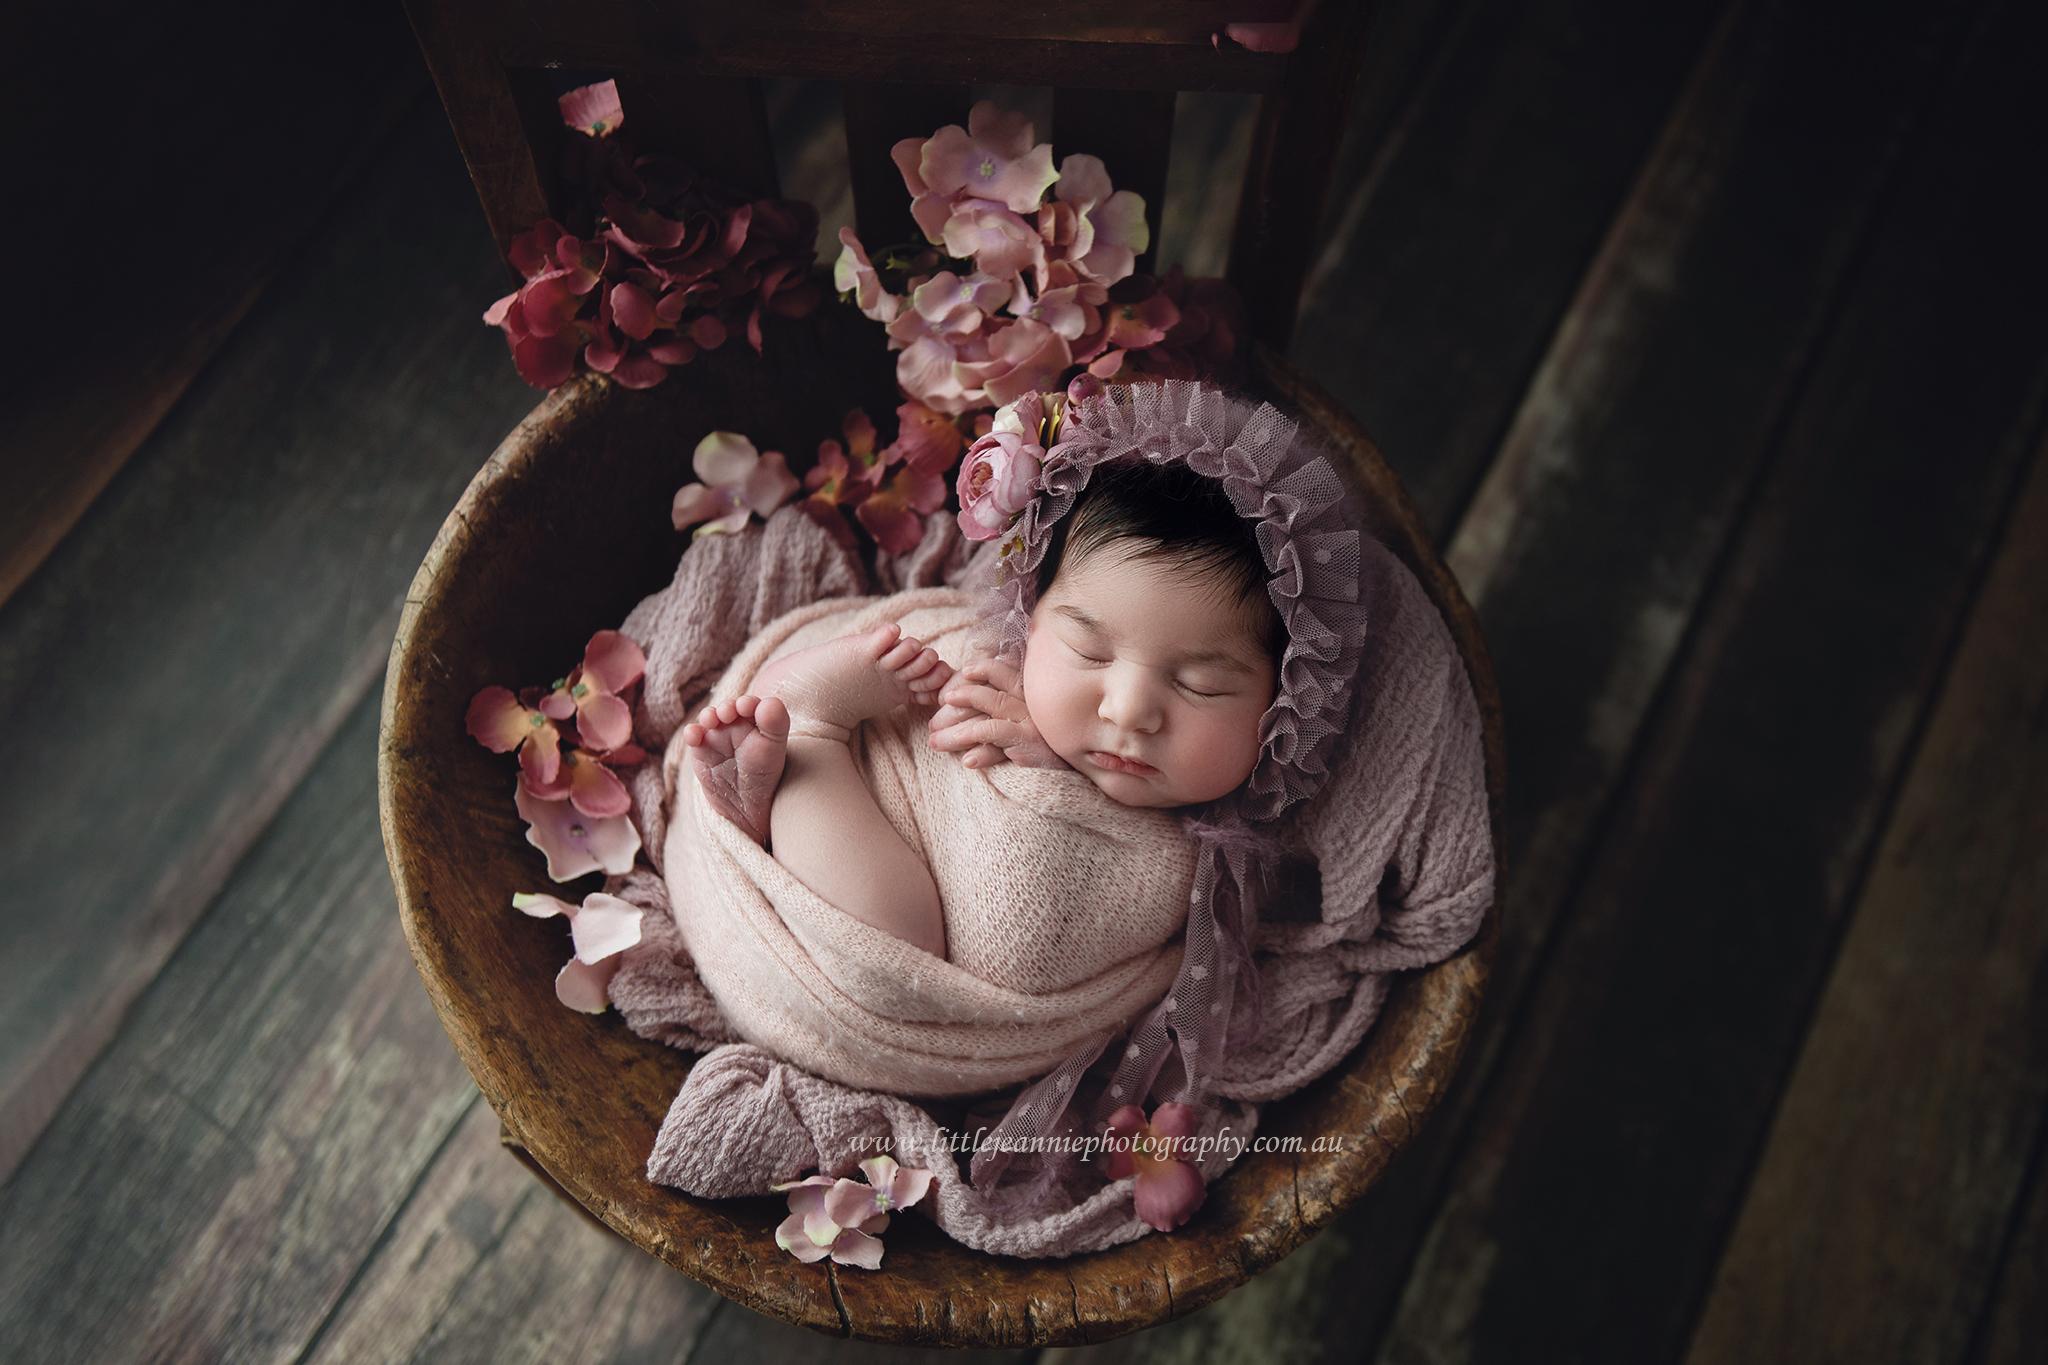 Newborn with flowers photos